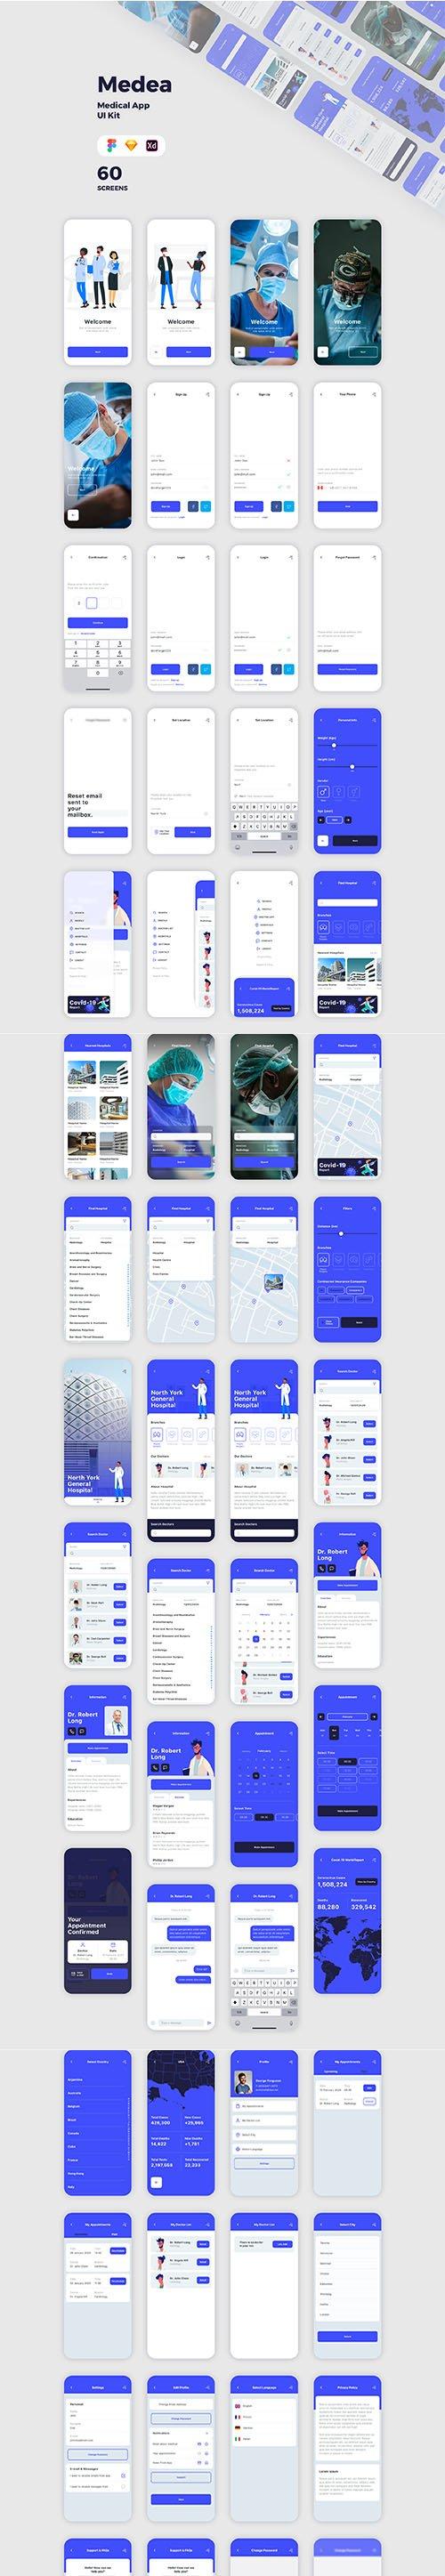 Medea Medical App UI Kit